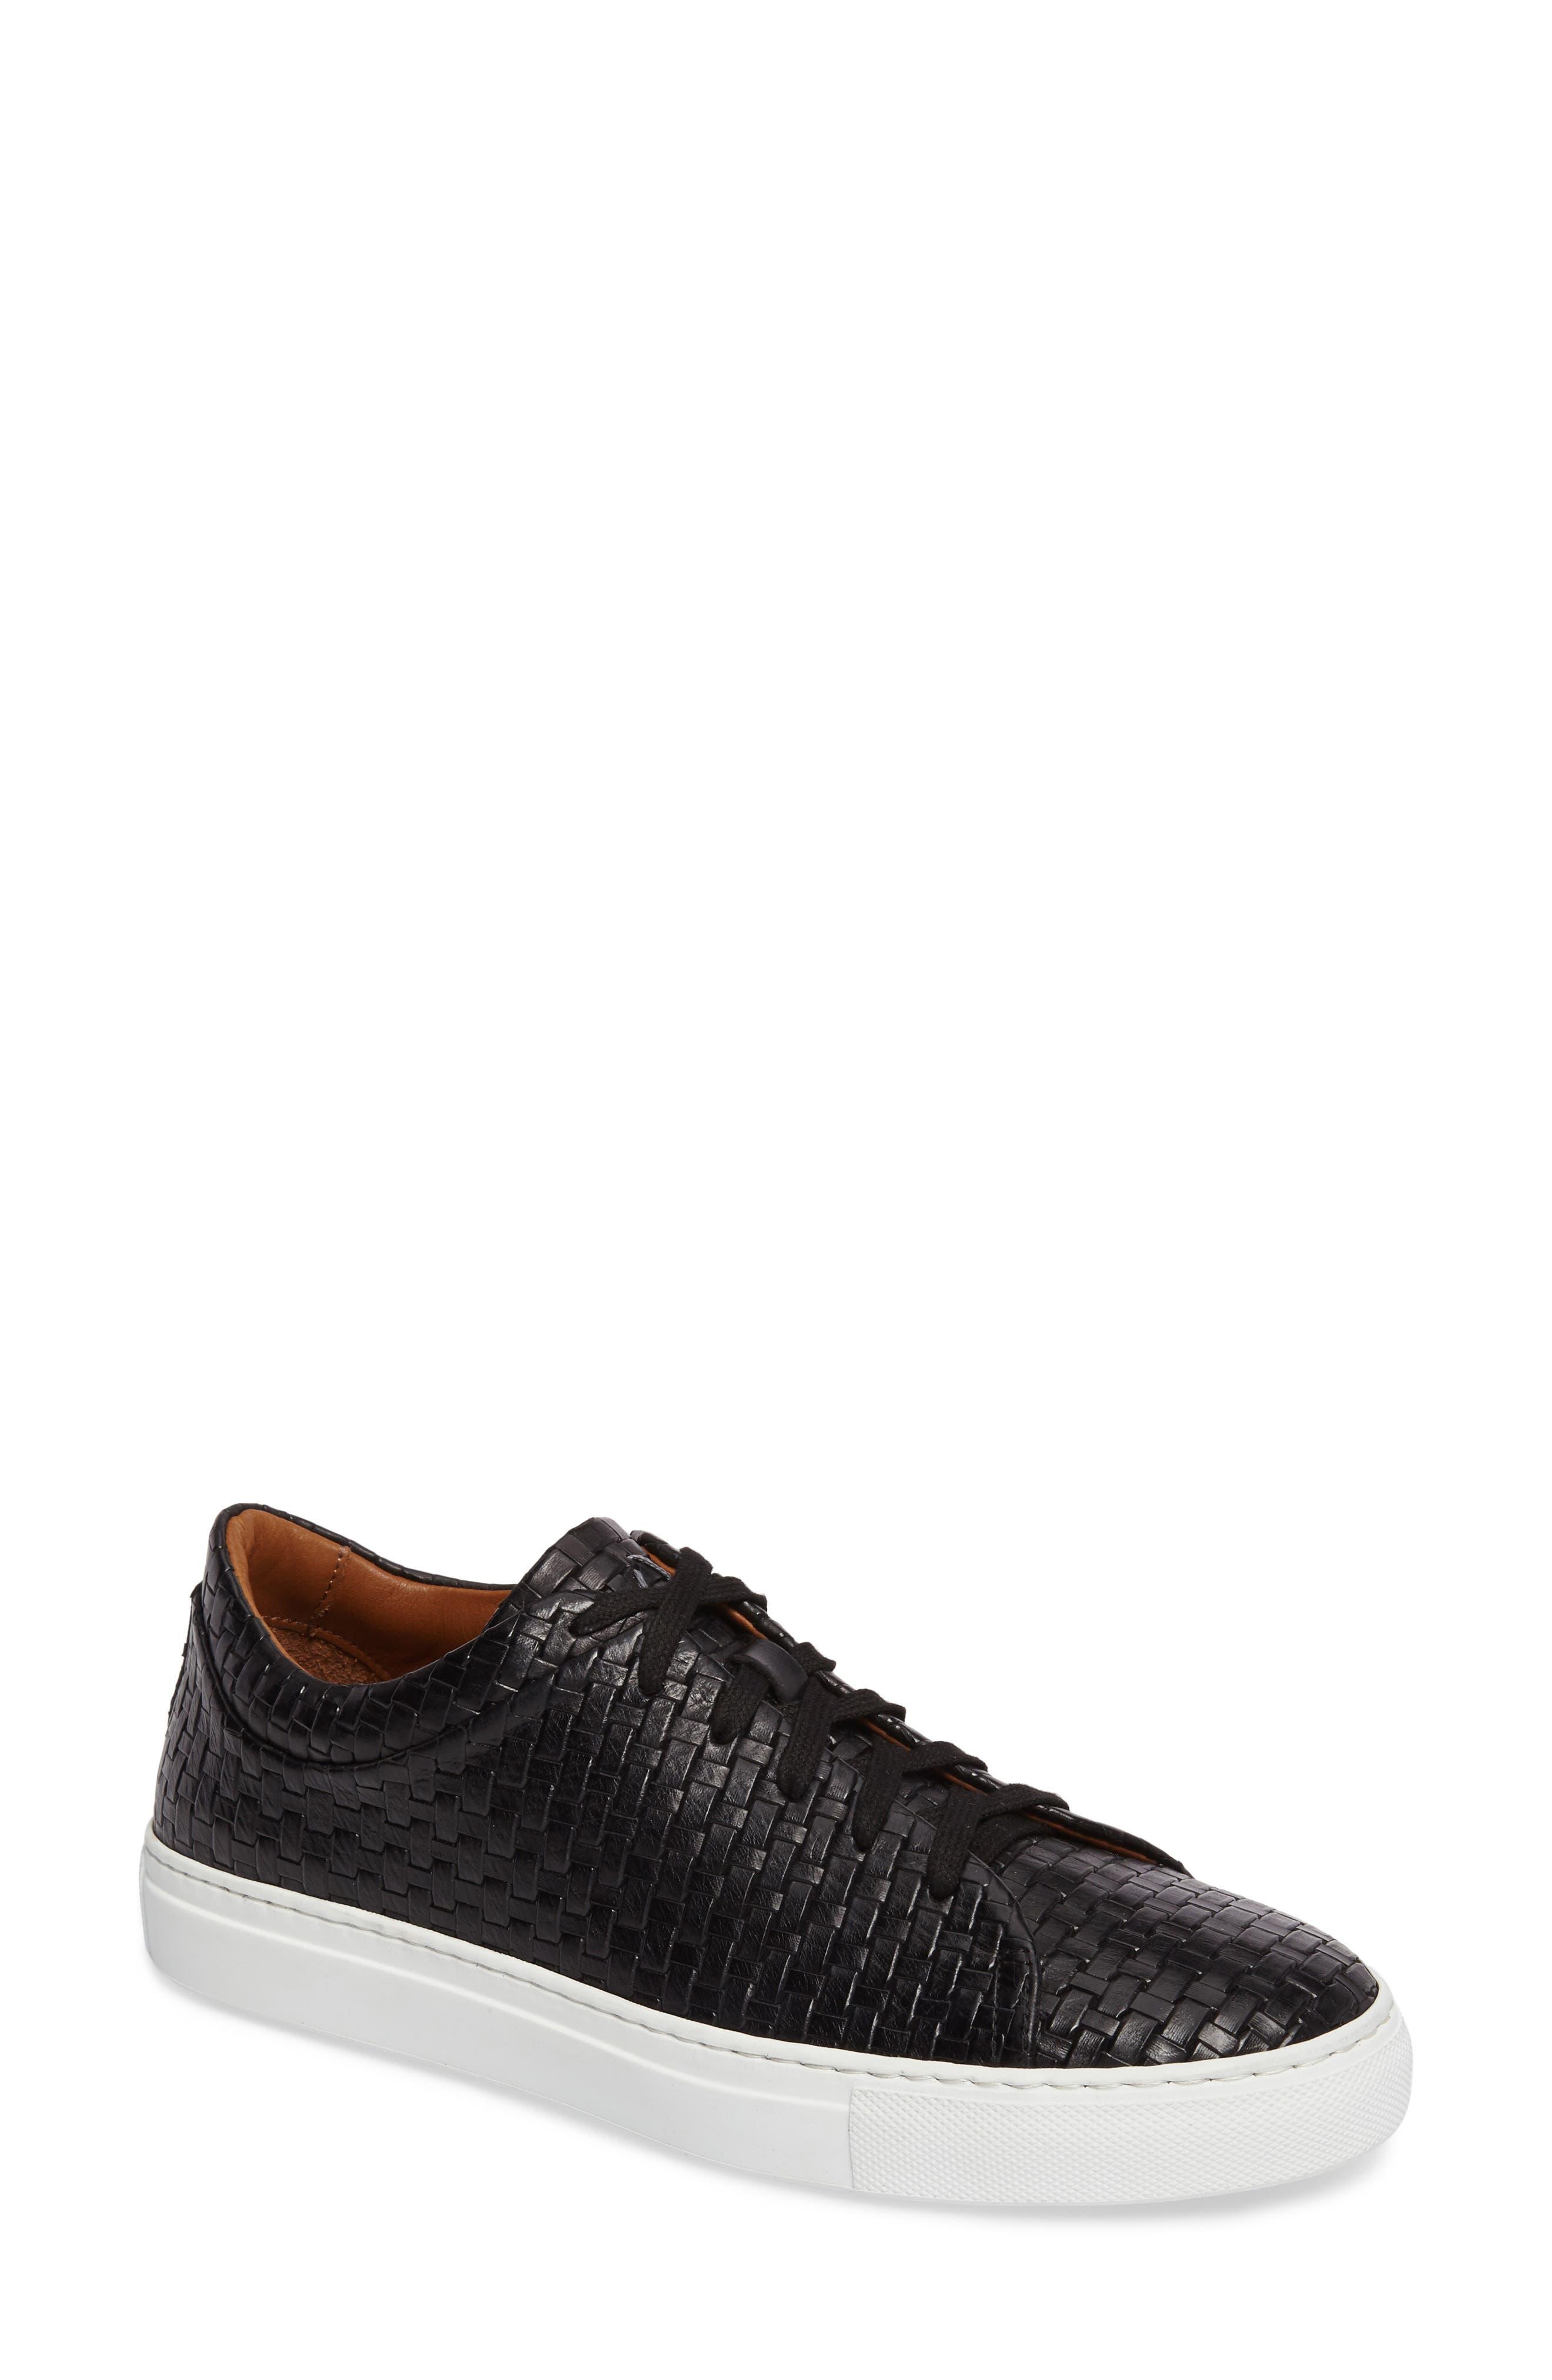 Avery Weatherproof Sneaker,                         Main,                         color, Black